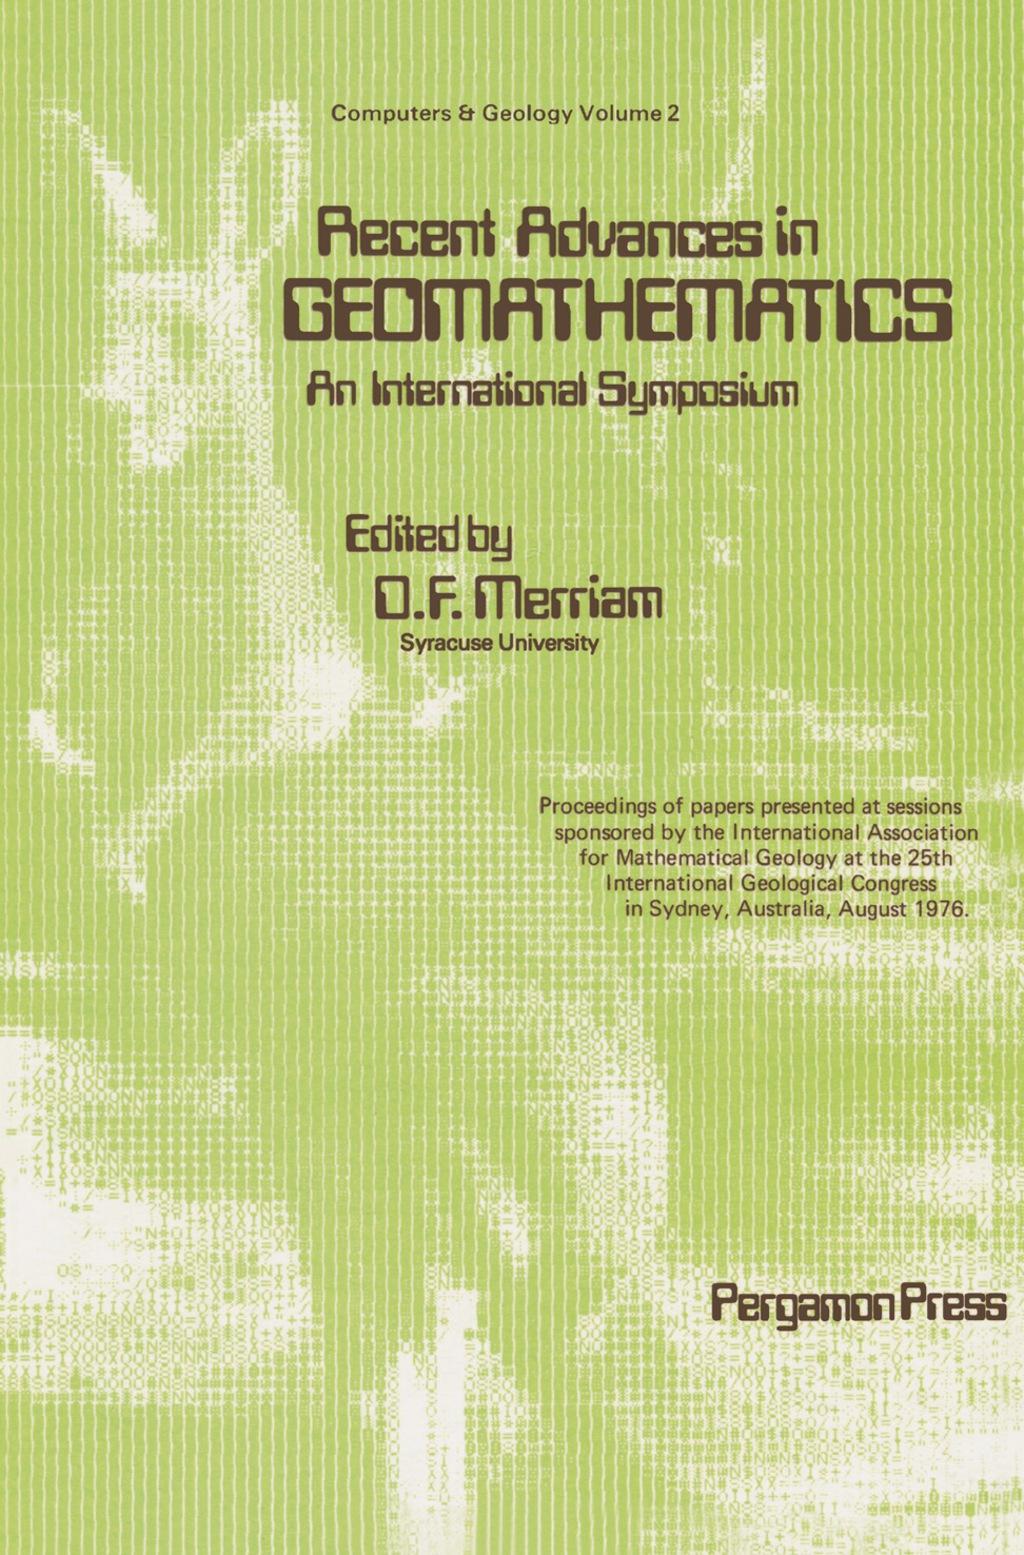 Recent Advances in Geomathematics - An International Symposium (eBook)